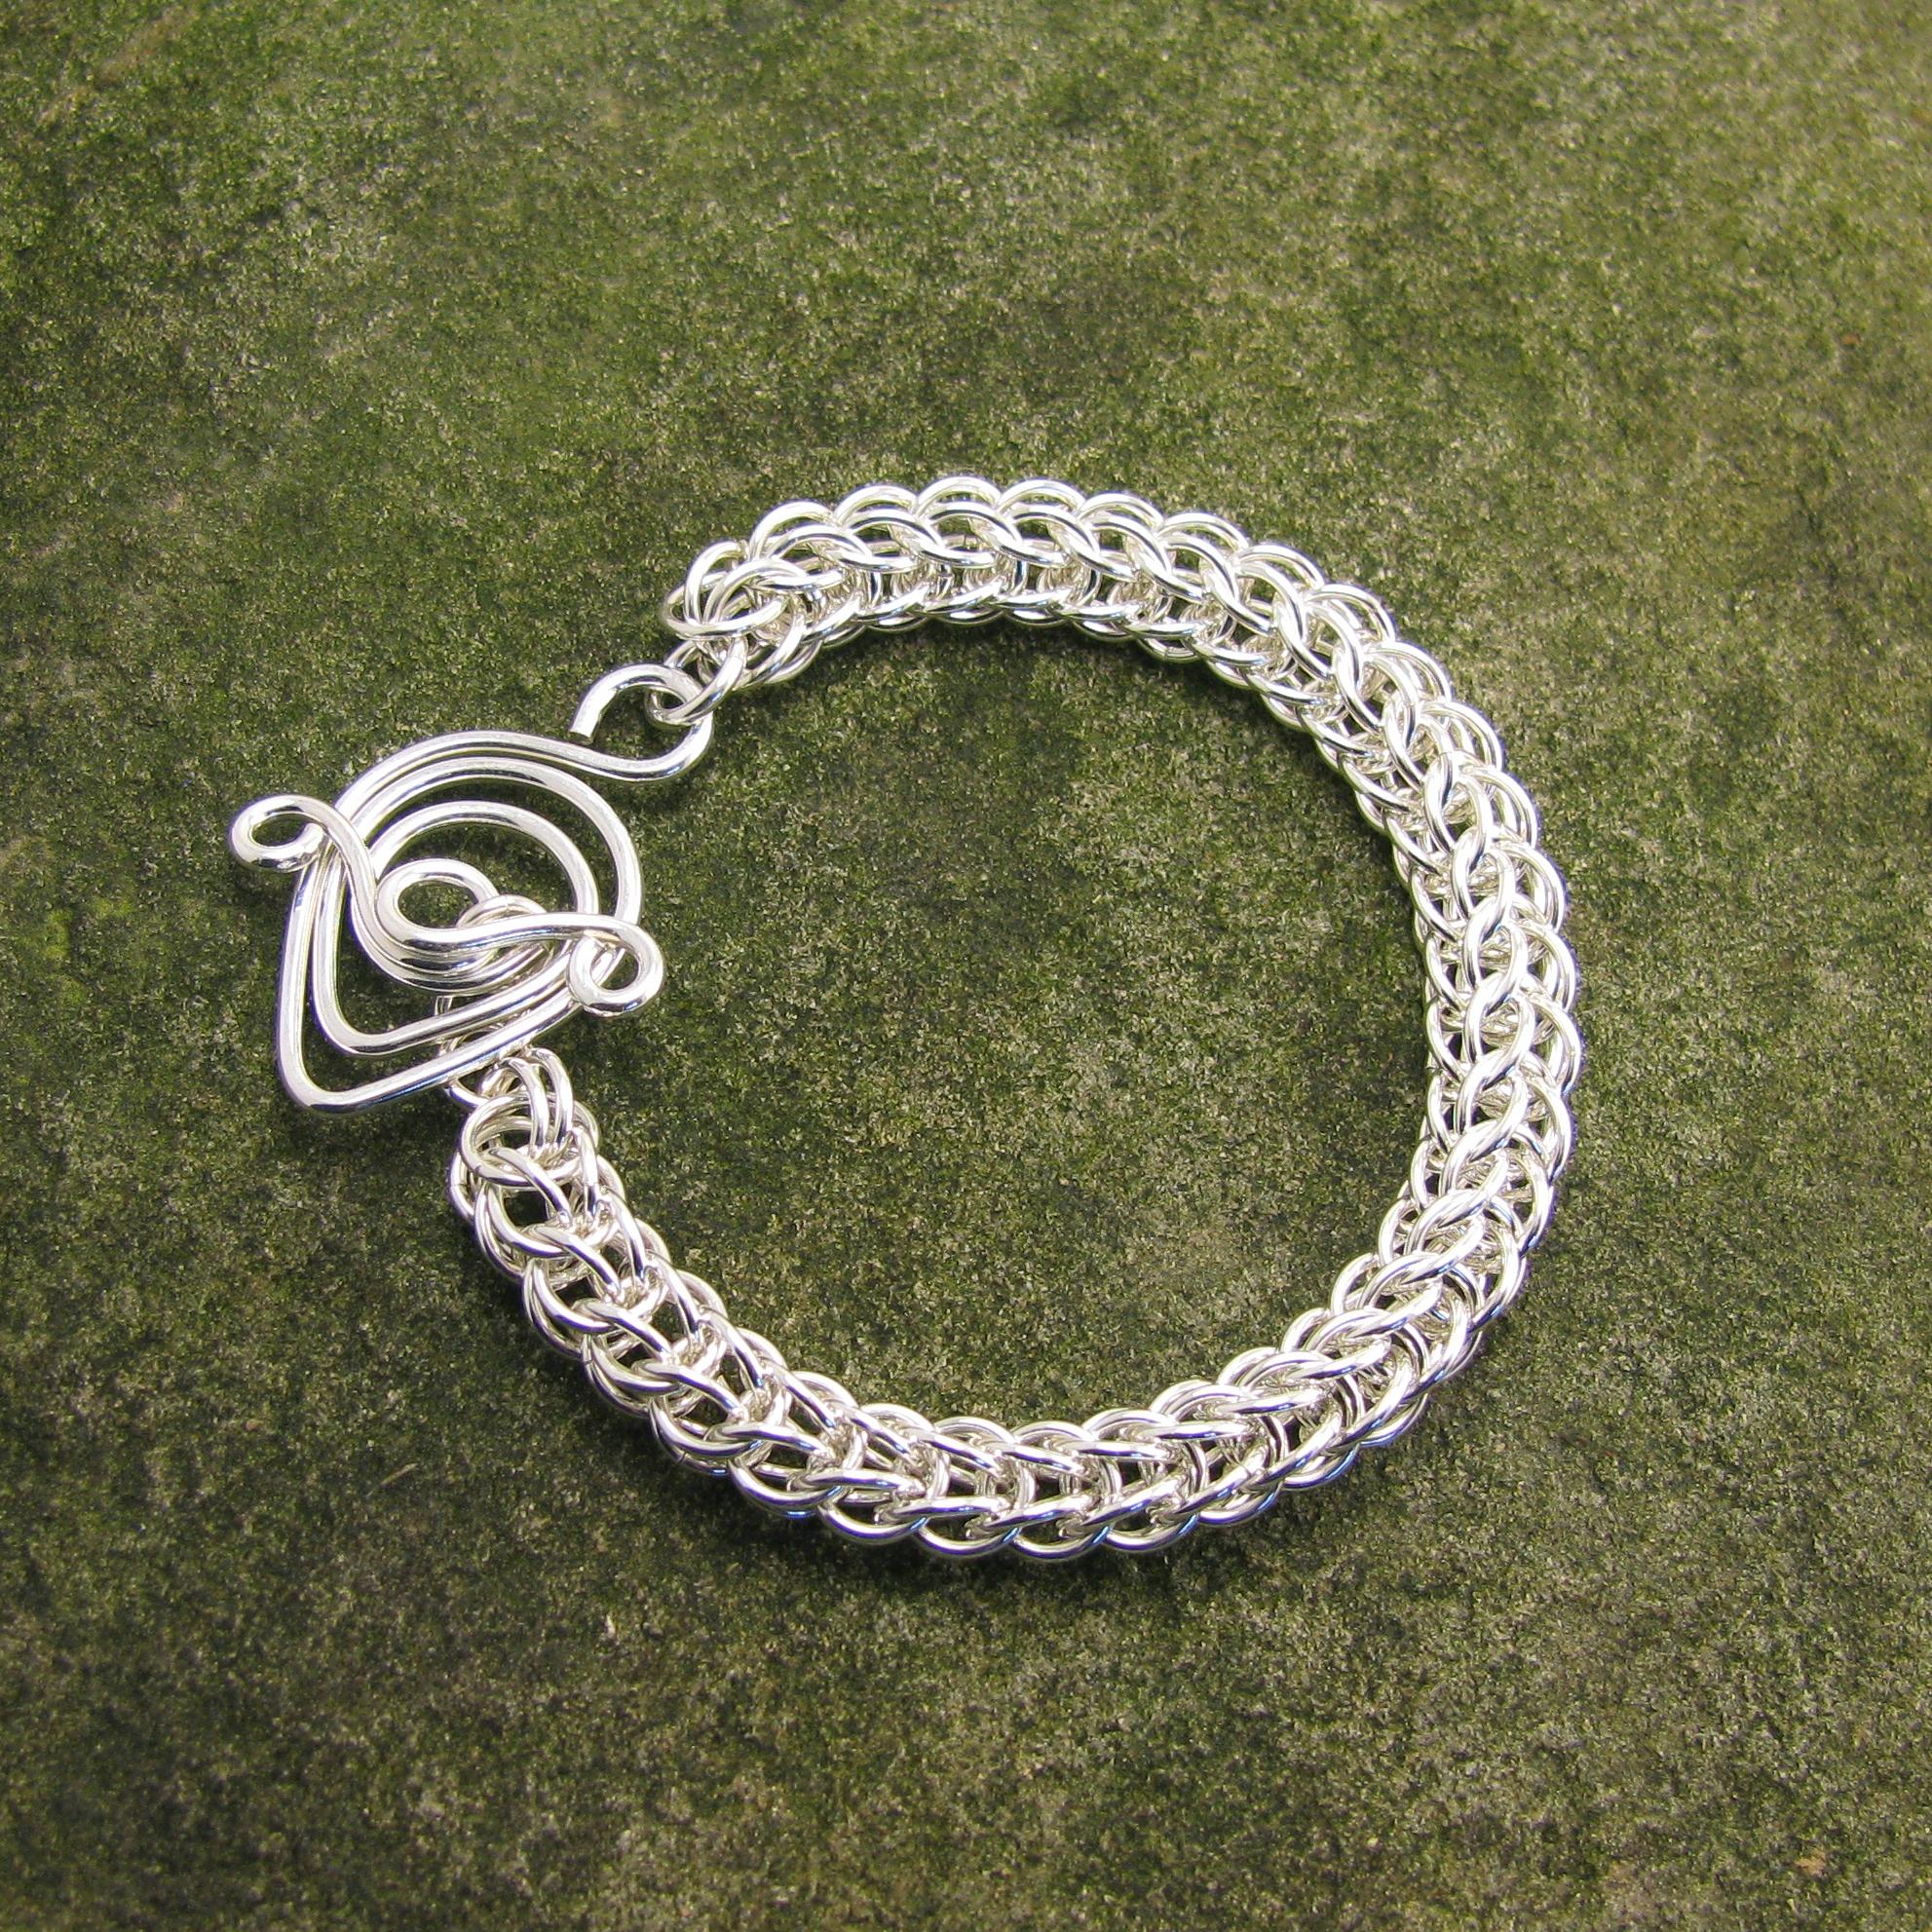 Full Persian Bracelet BR3005-S 176 BR3005-M 189 BR3005-L201.jpg